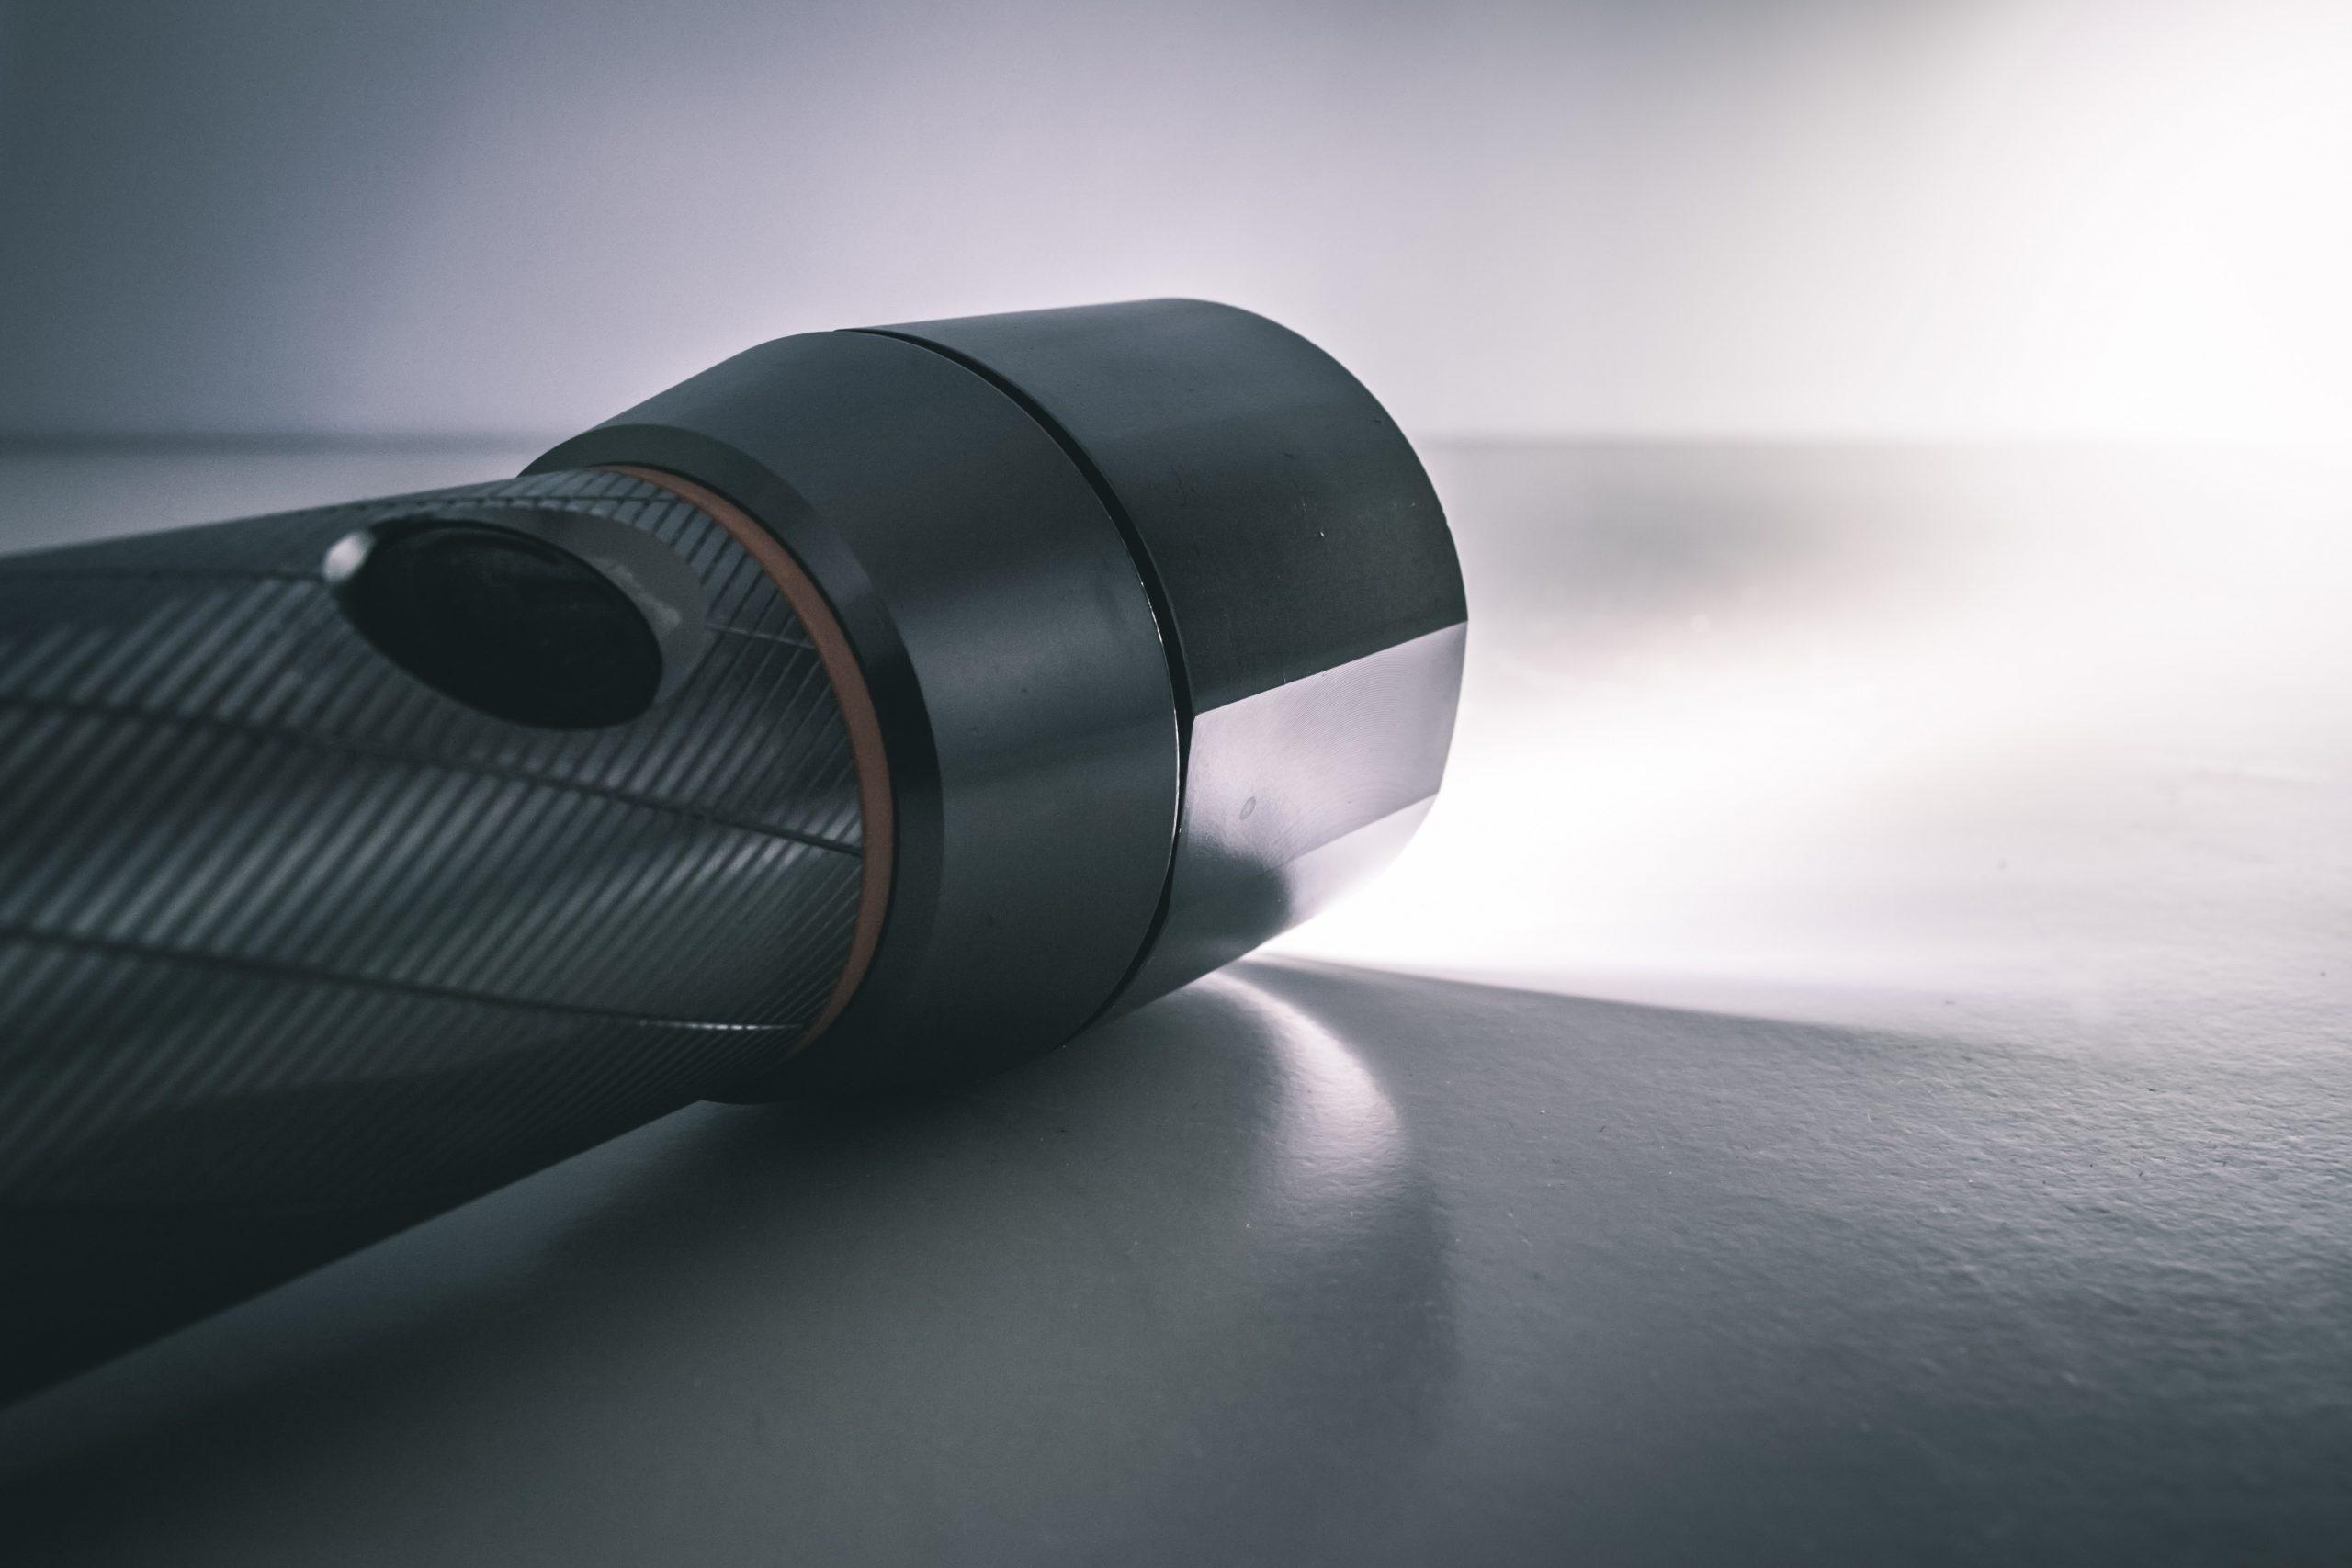 Na foto uma lanterna acesa.